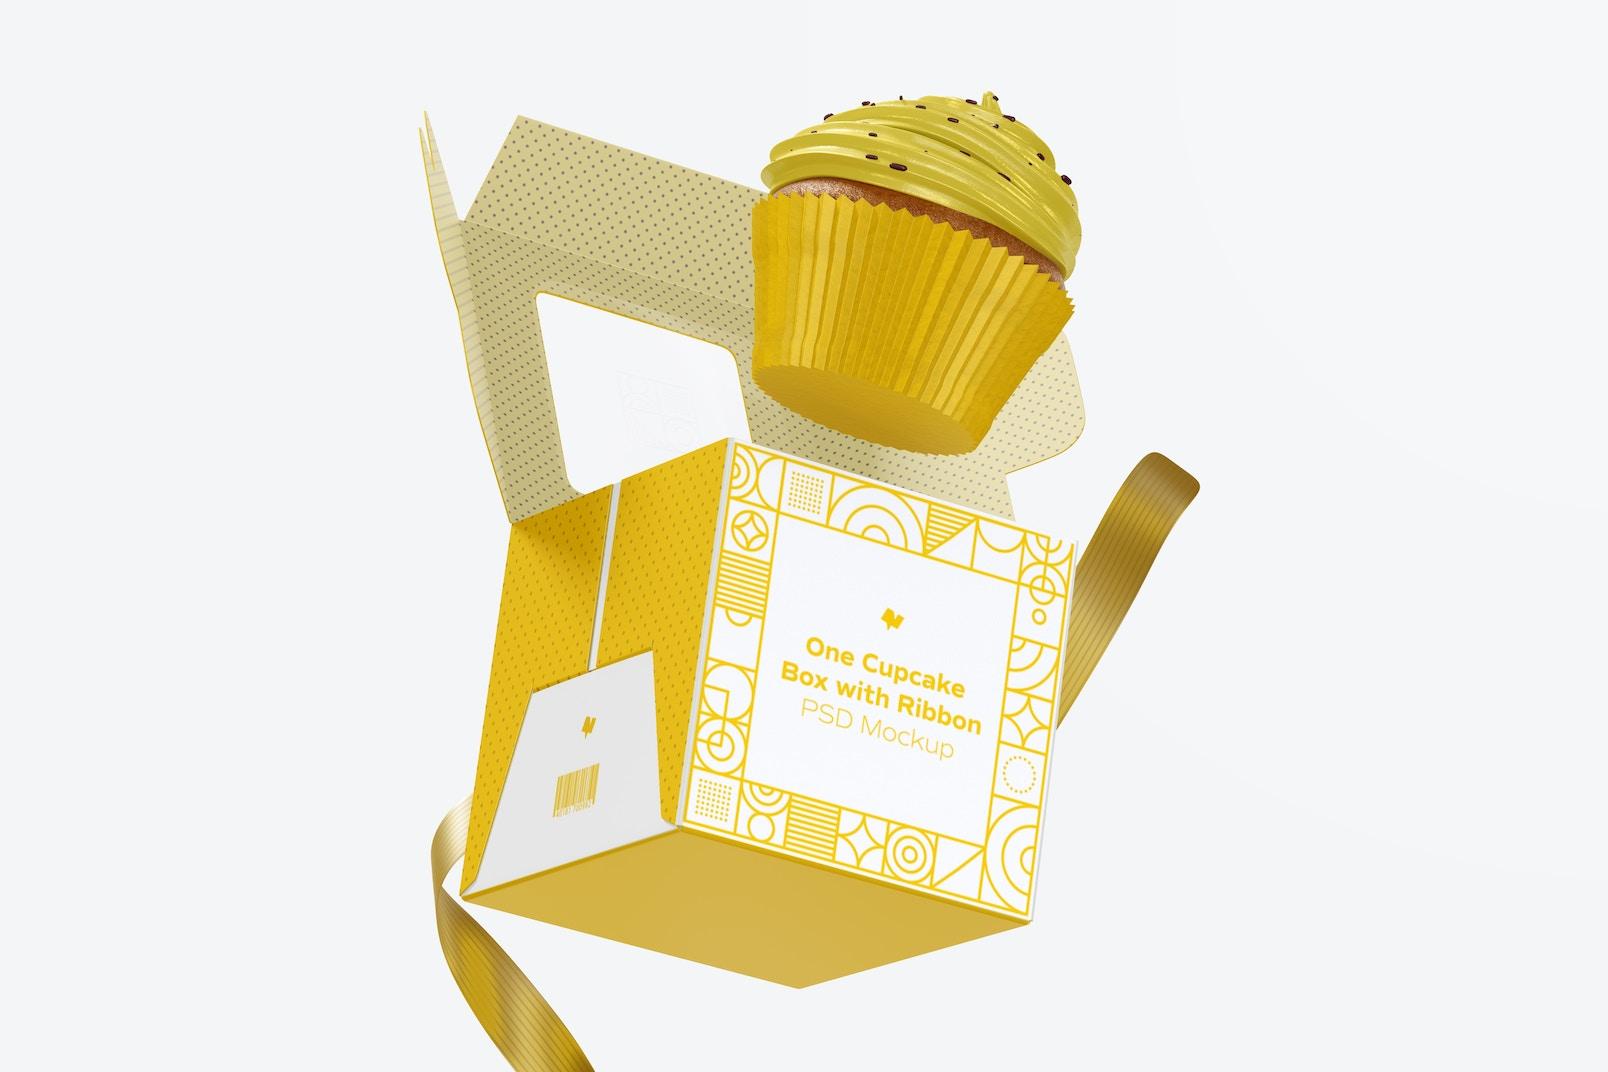 One Cupcake Box with Ribbon Mockup, Falling